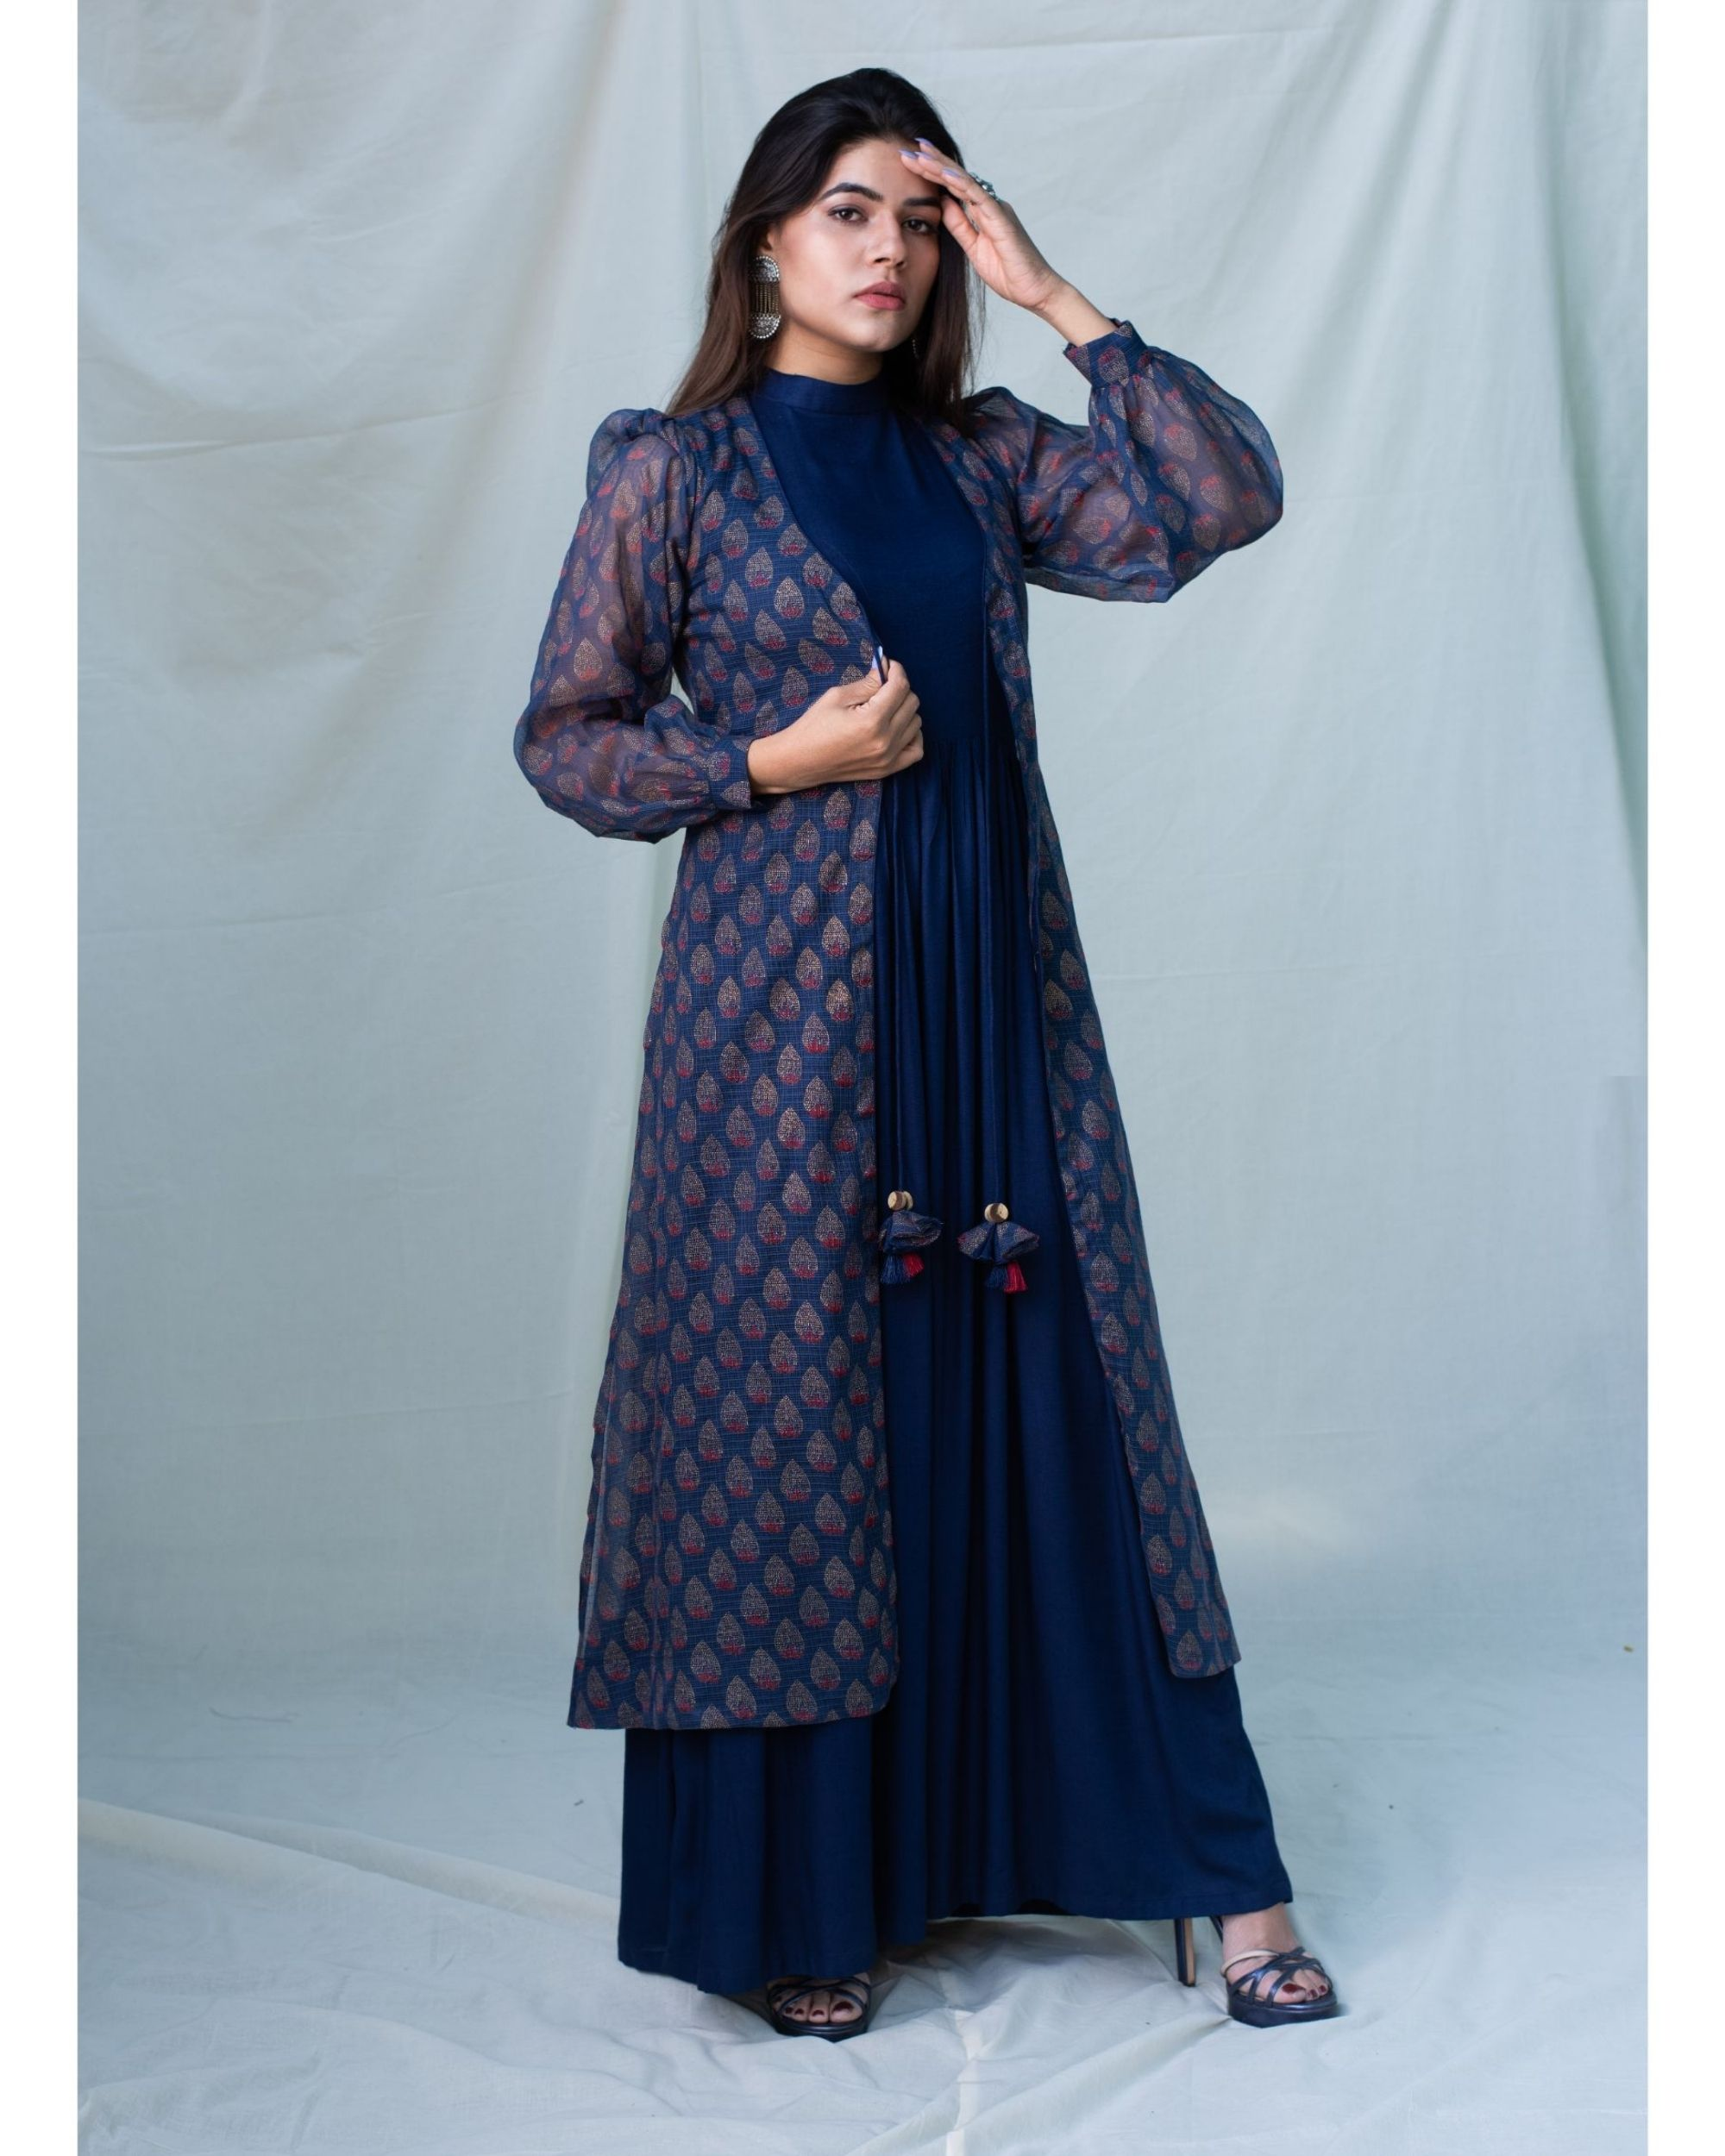 Navy blue printed kota doria jacket and gathered dress - Set Of Two